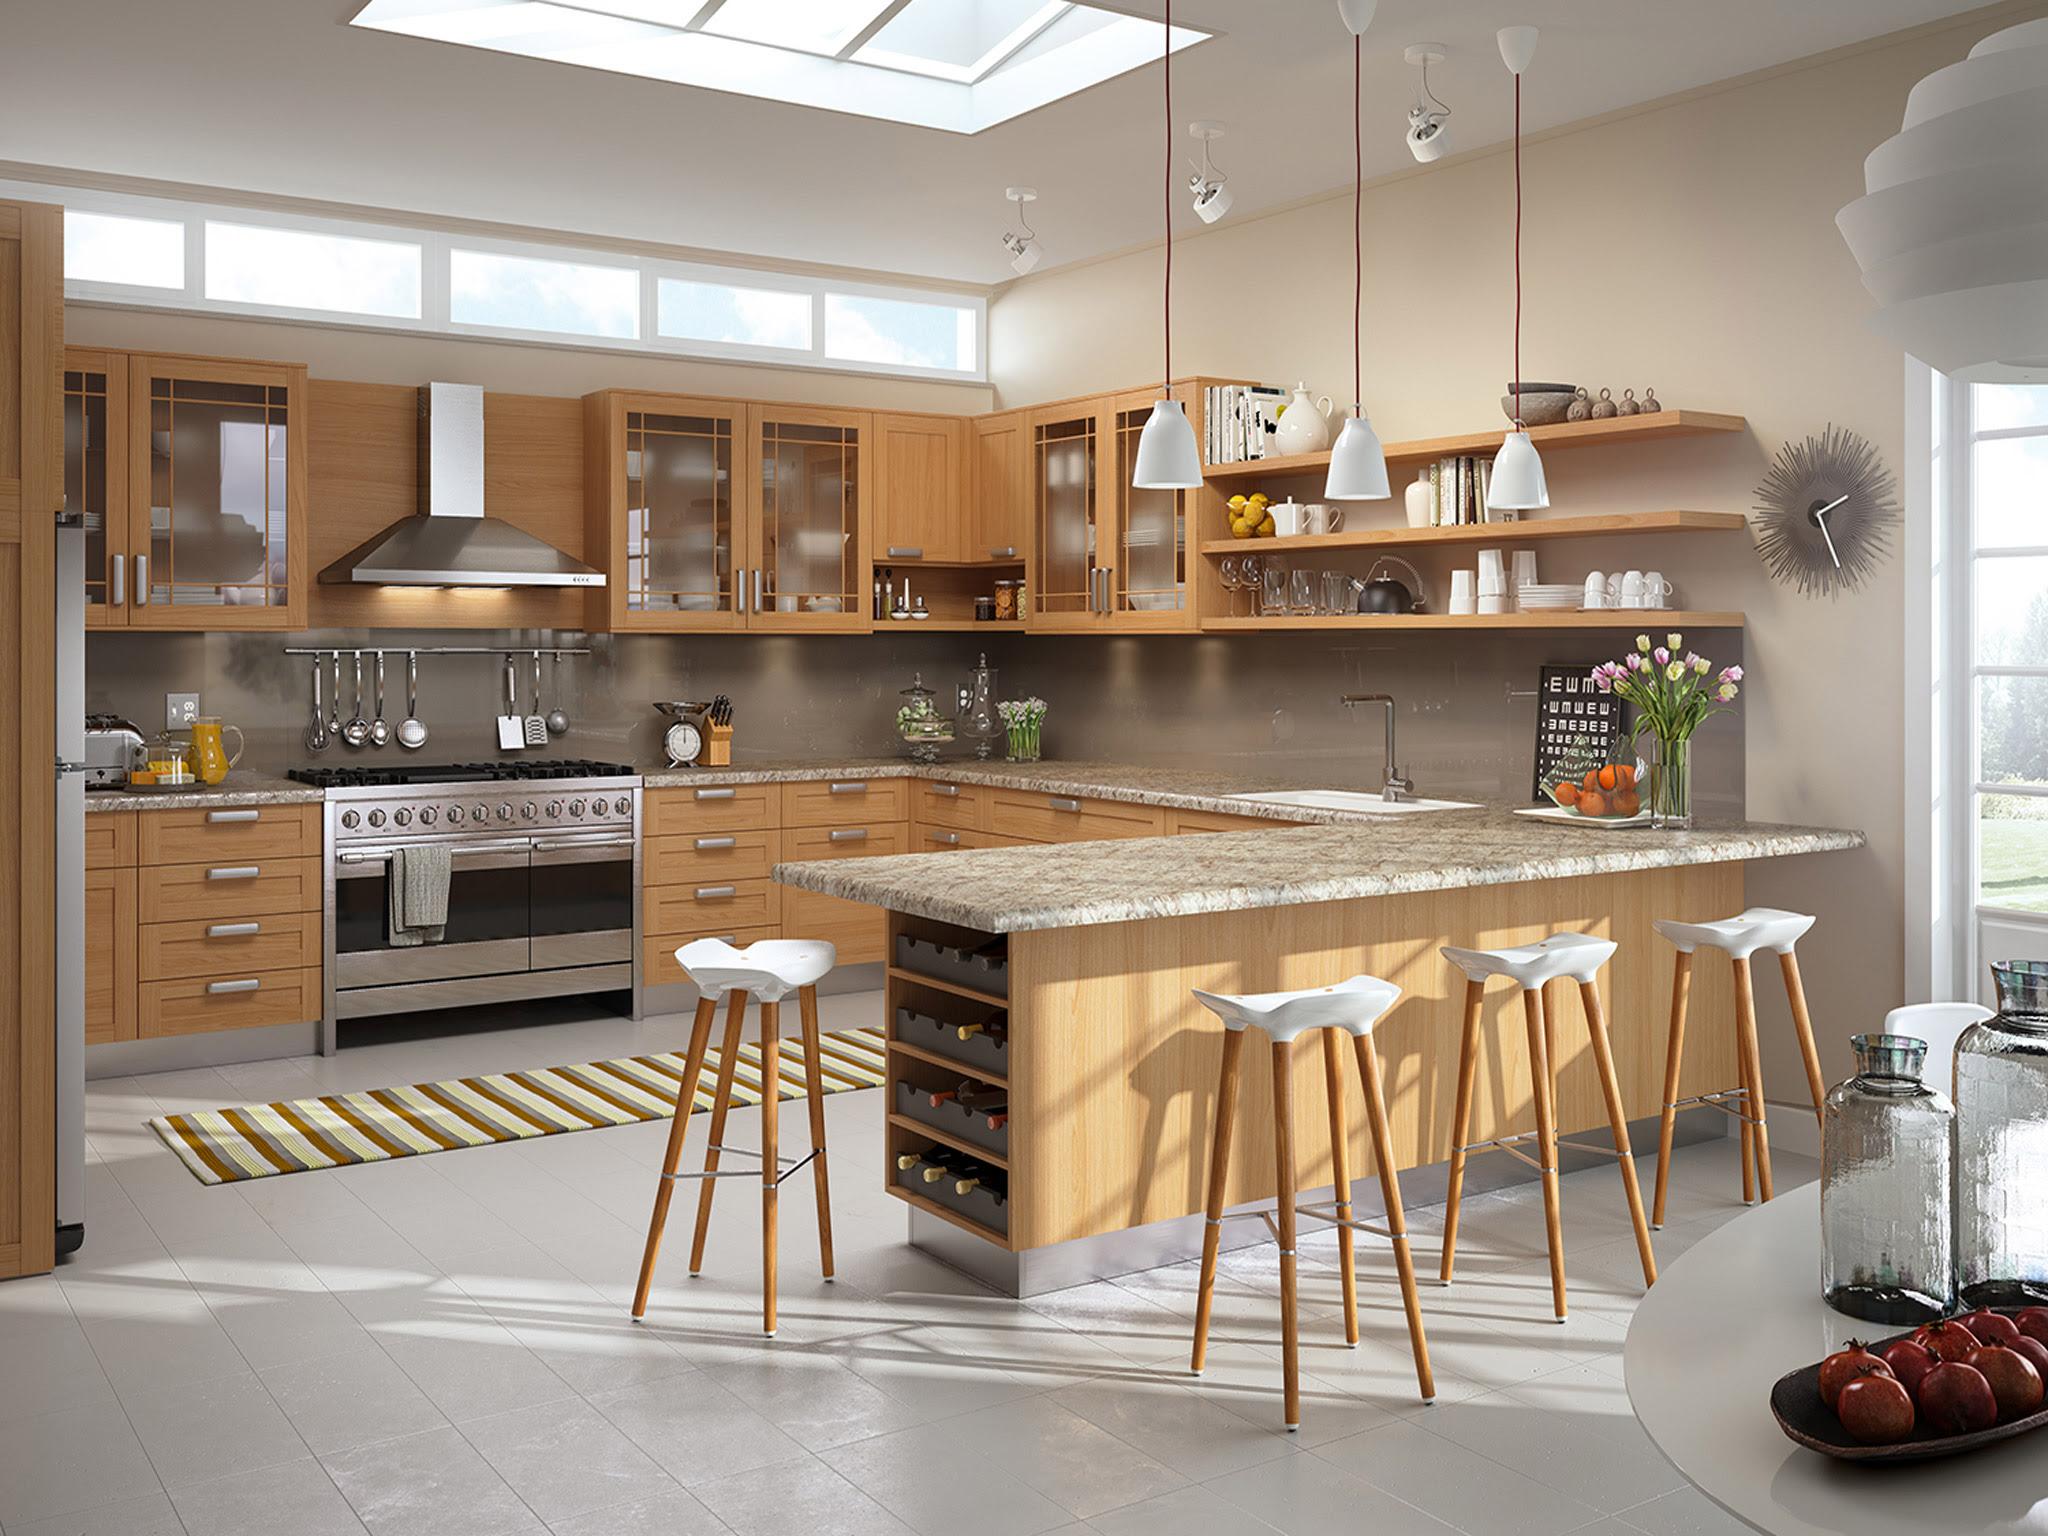 5 Favorite Types of Granite Countertops for Stunning ...